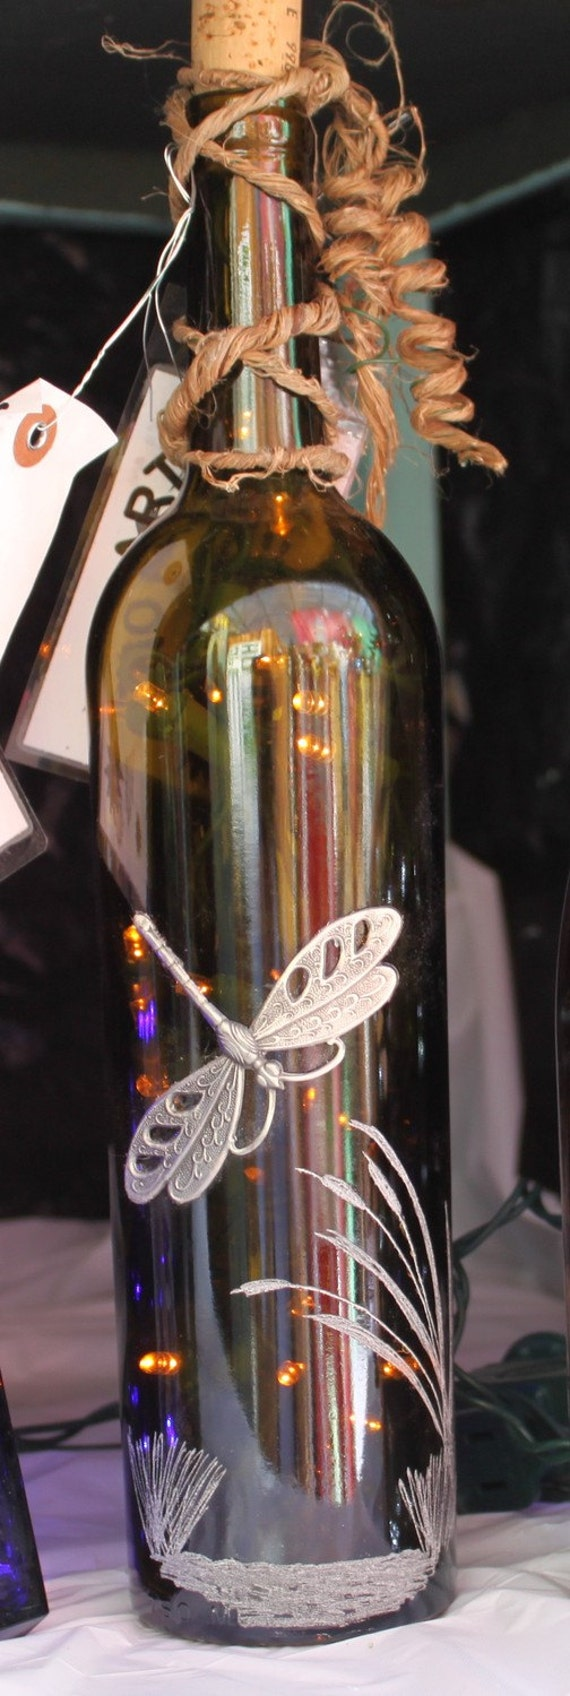 Wine Bottle Led Dragonfly Night Light Decrorative By